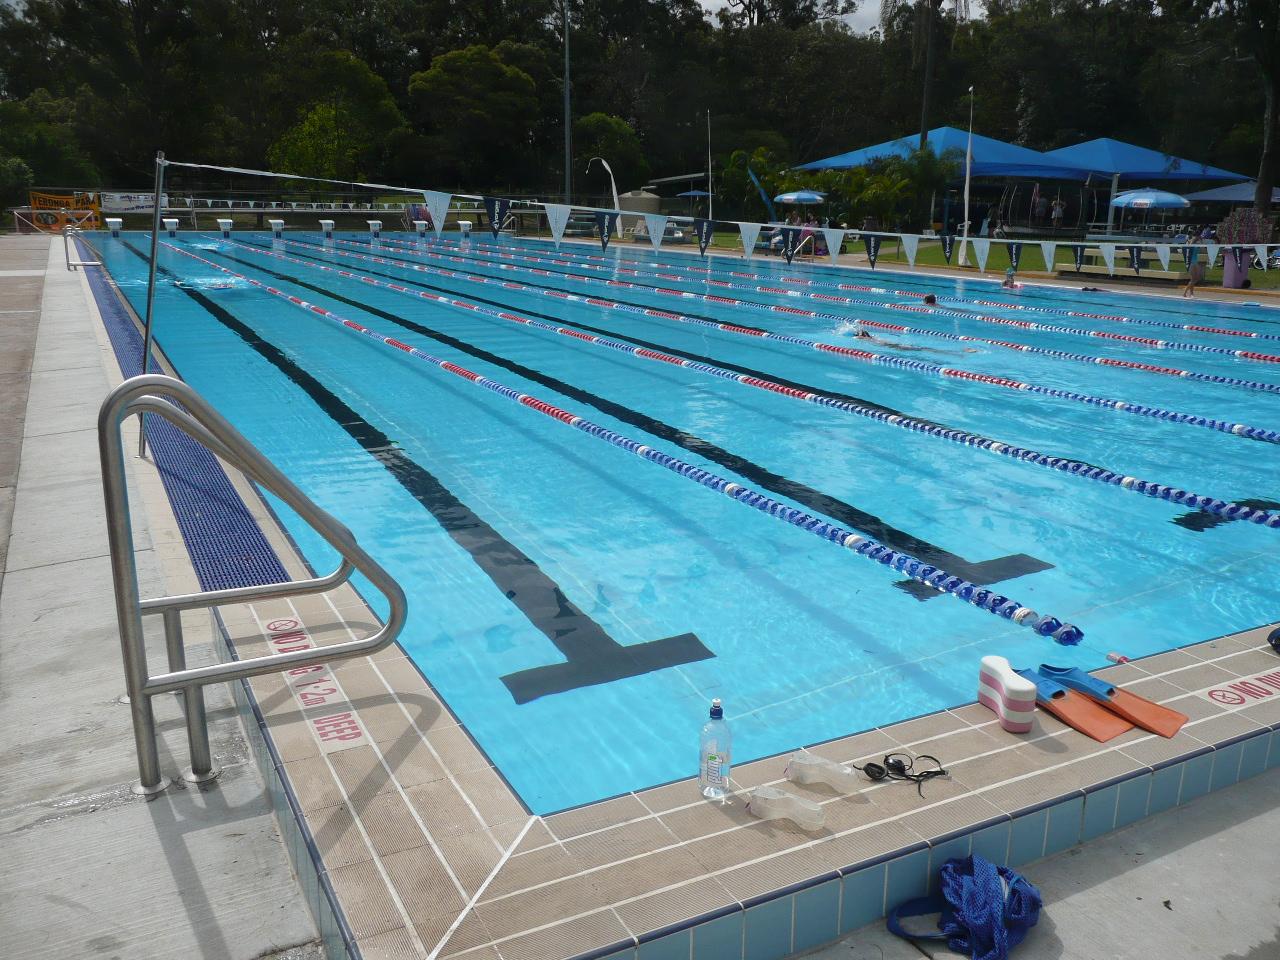 Olympic Swimming Pool 2012